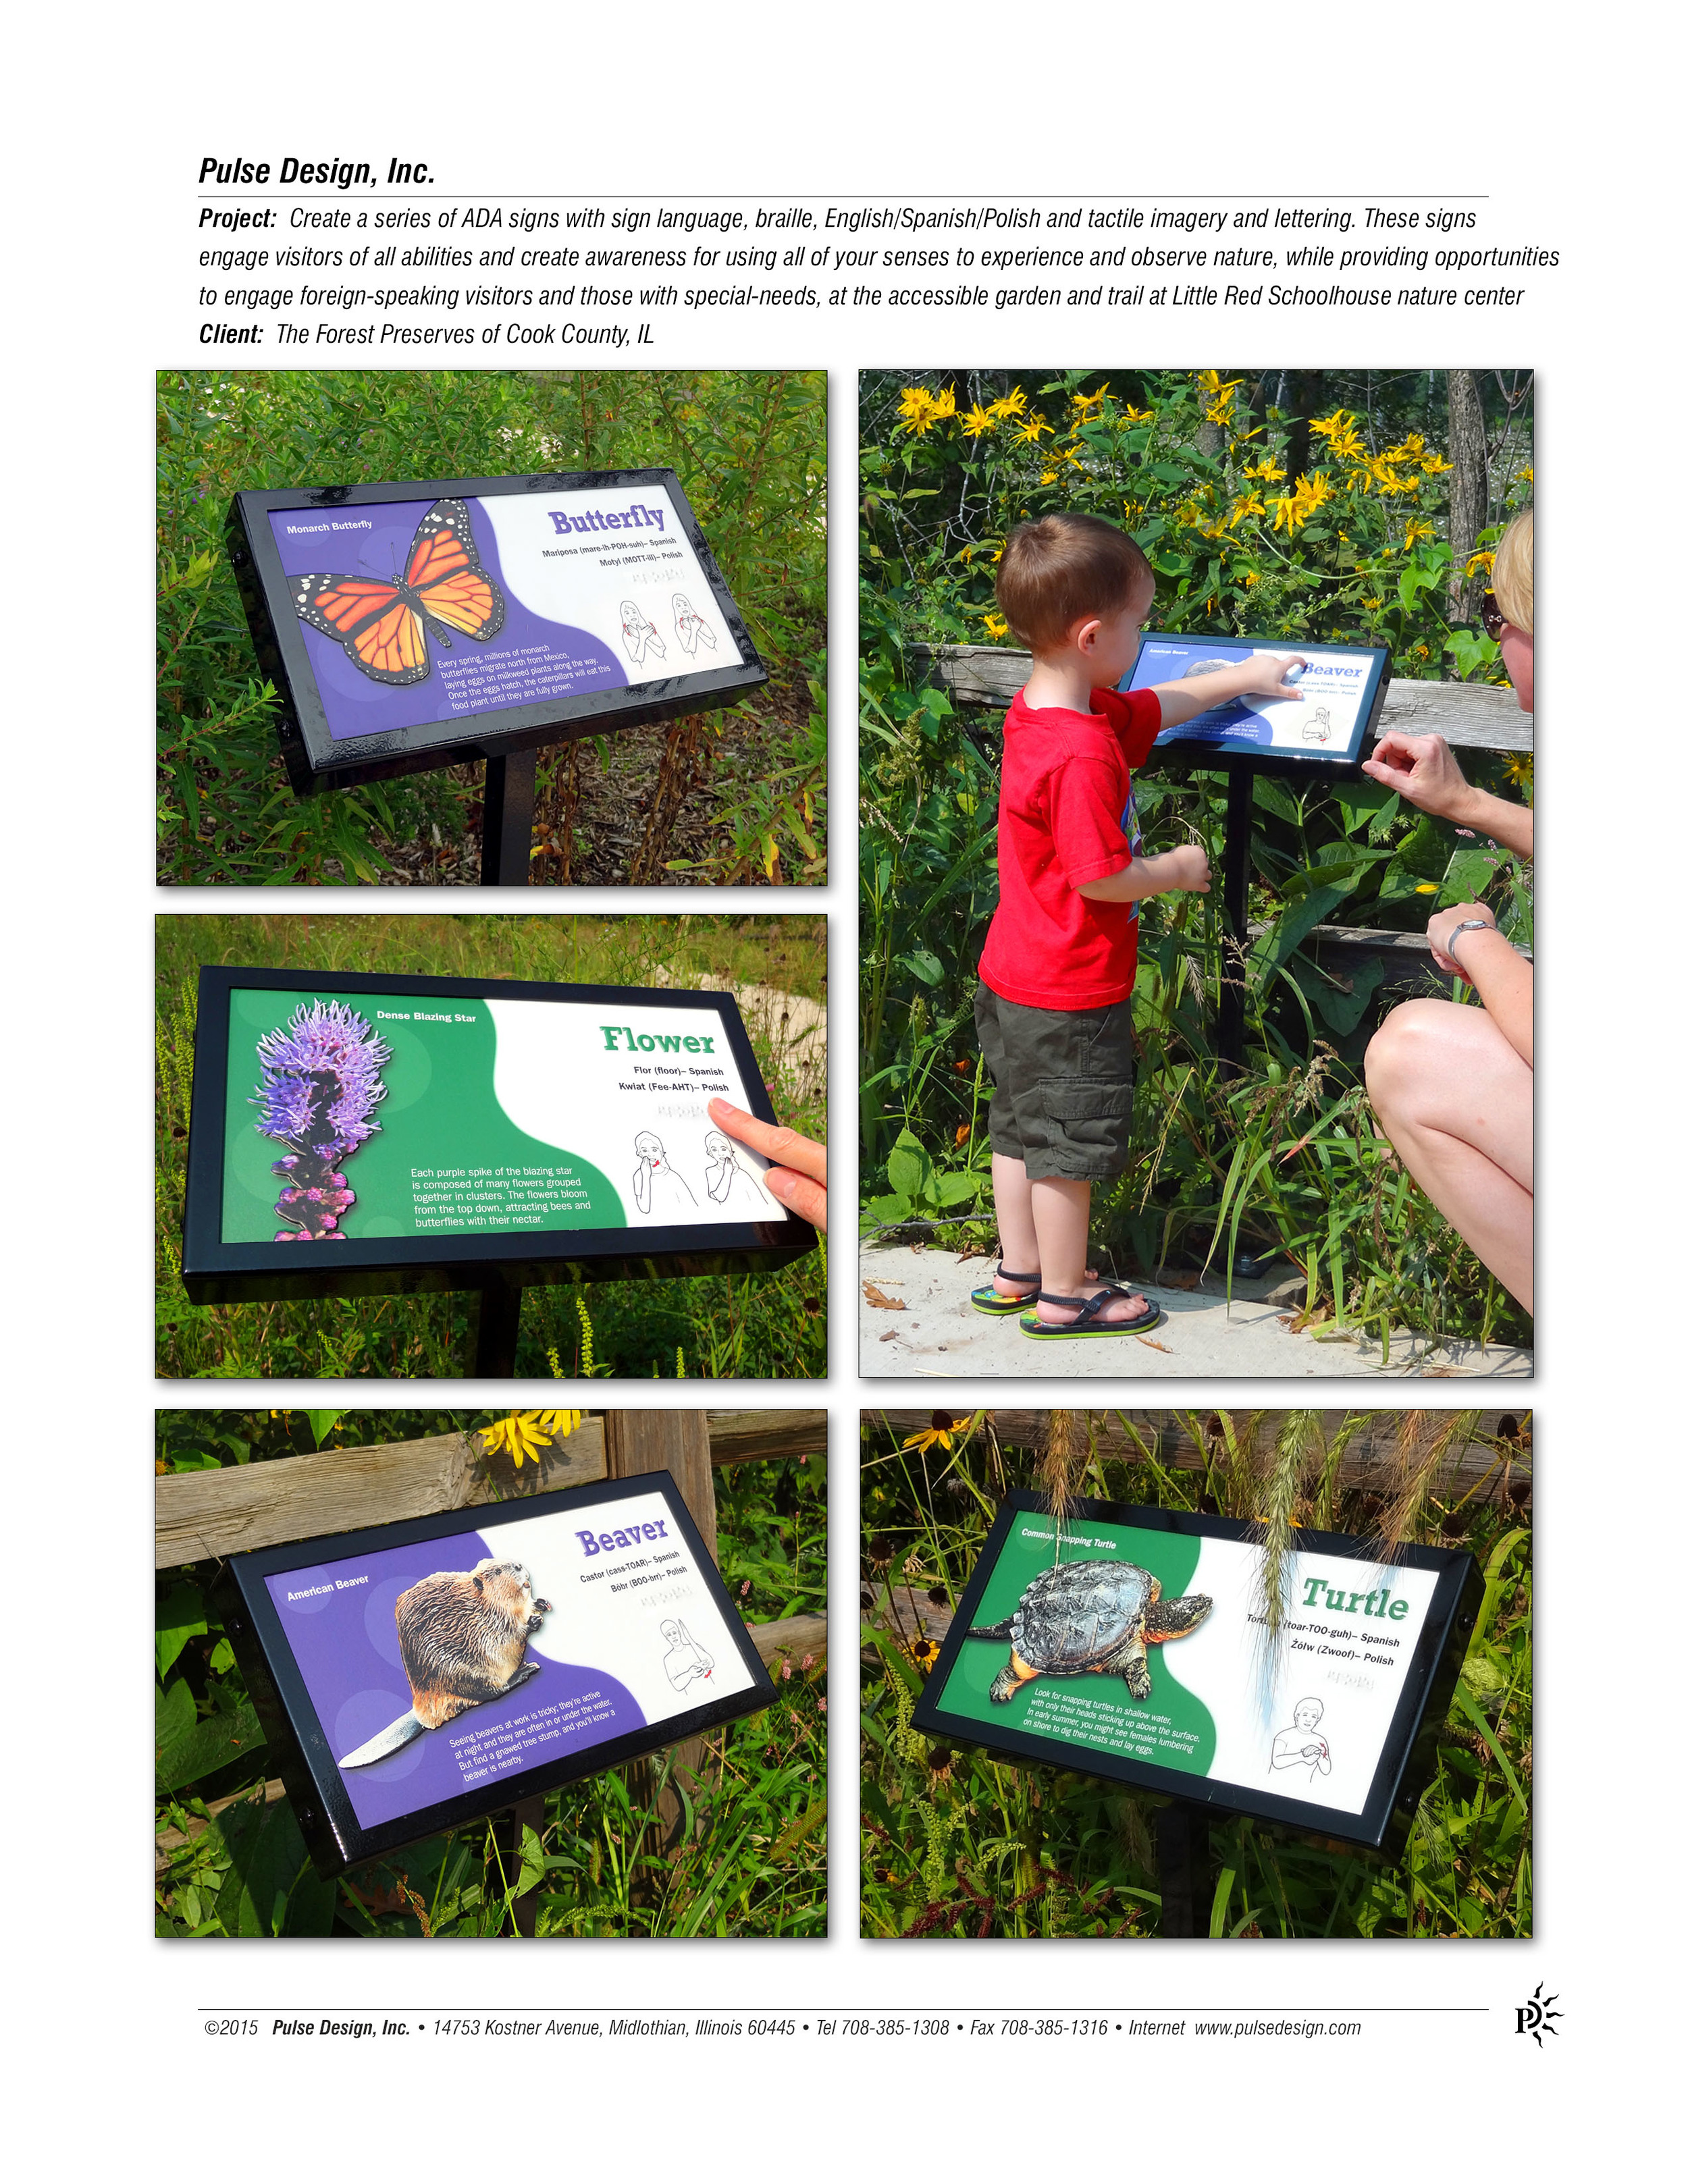 LittleRedSchoolhouse-Accessible-Garden-Trail-Sign-Photos2-Pulse-Design-Inc.jpg